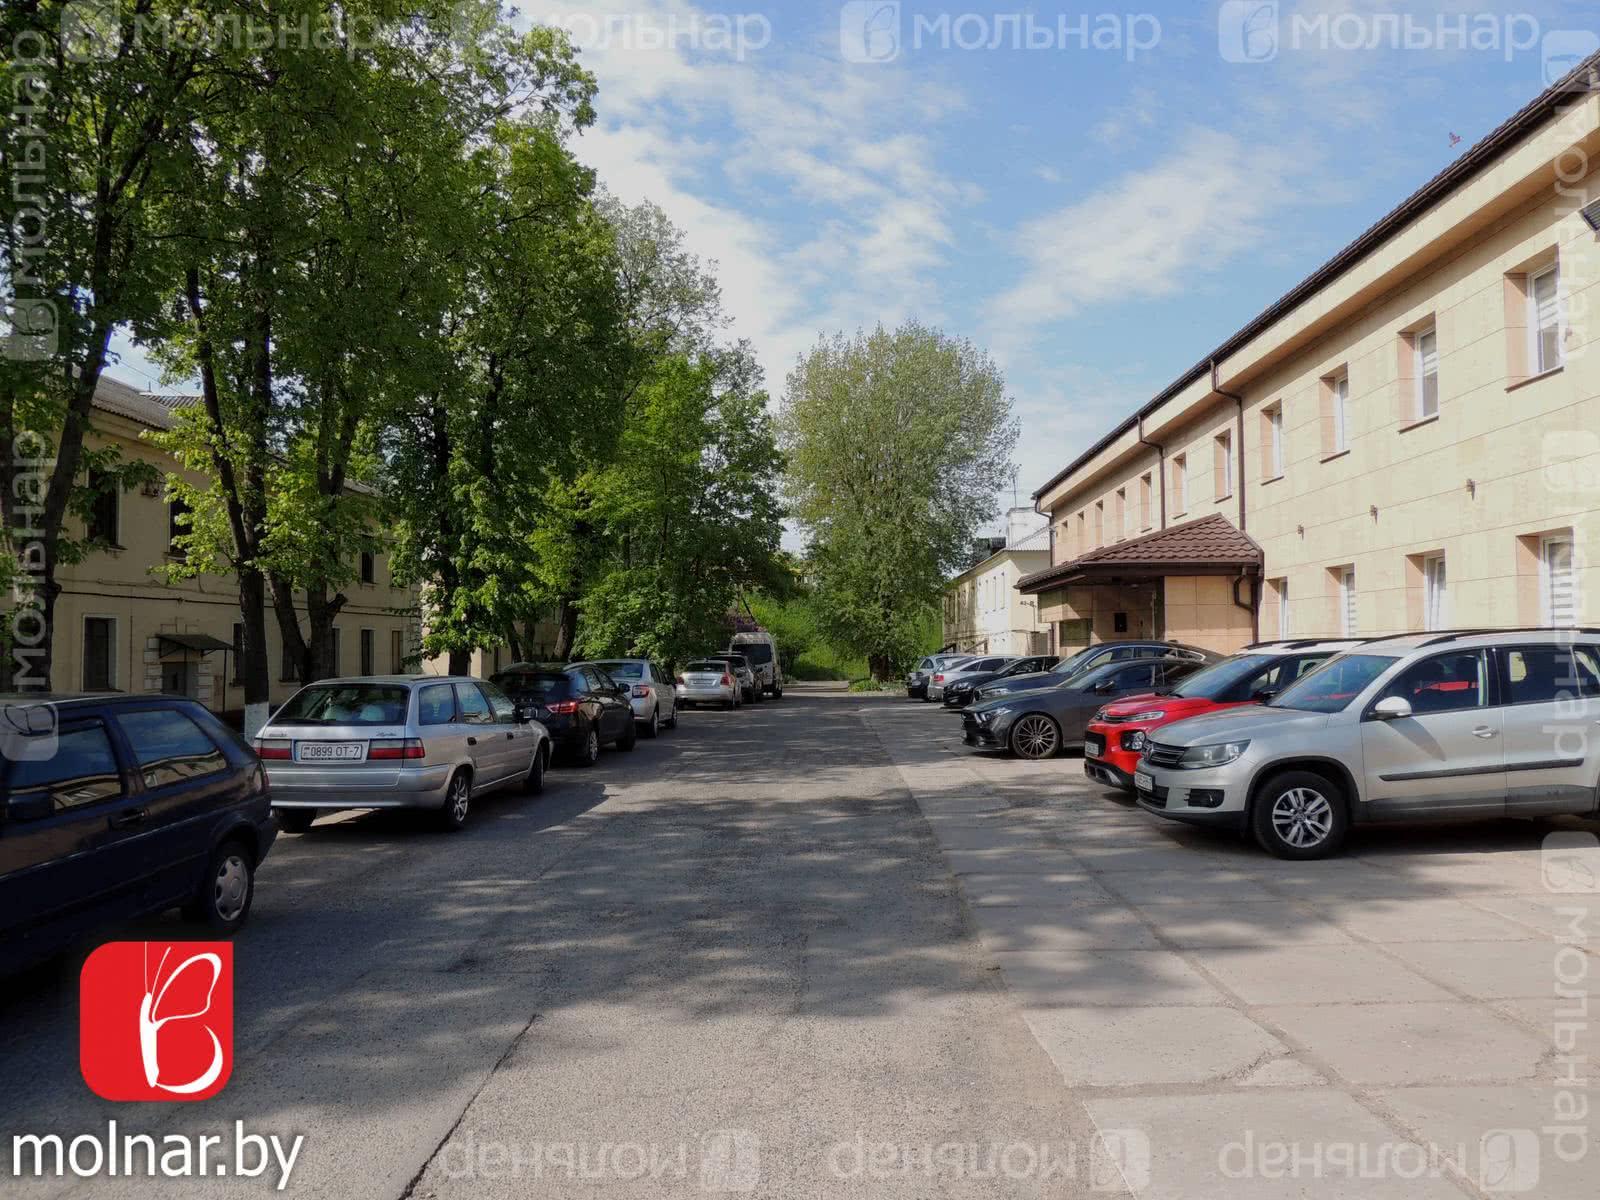 Купить склад на ул. Передовая, д. 111 в Минске - фото 4